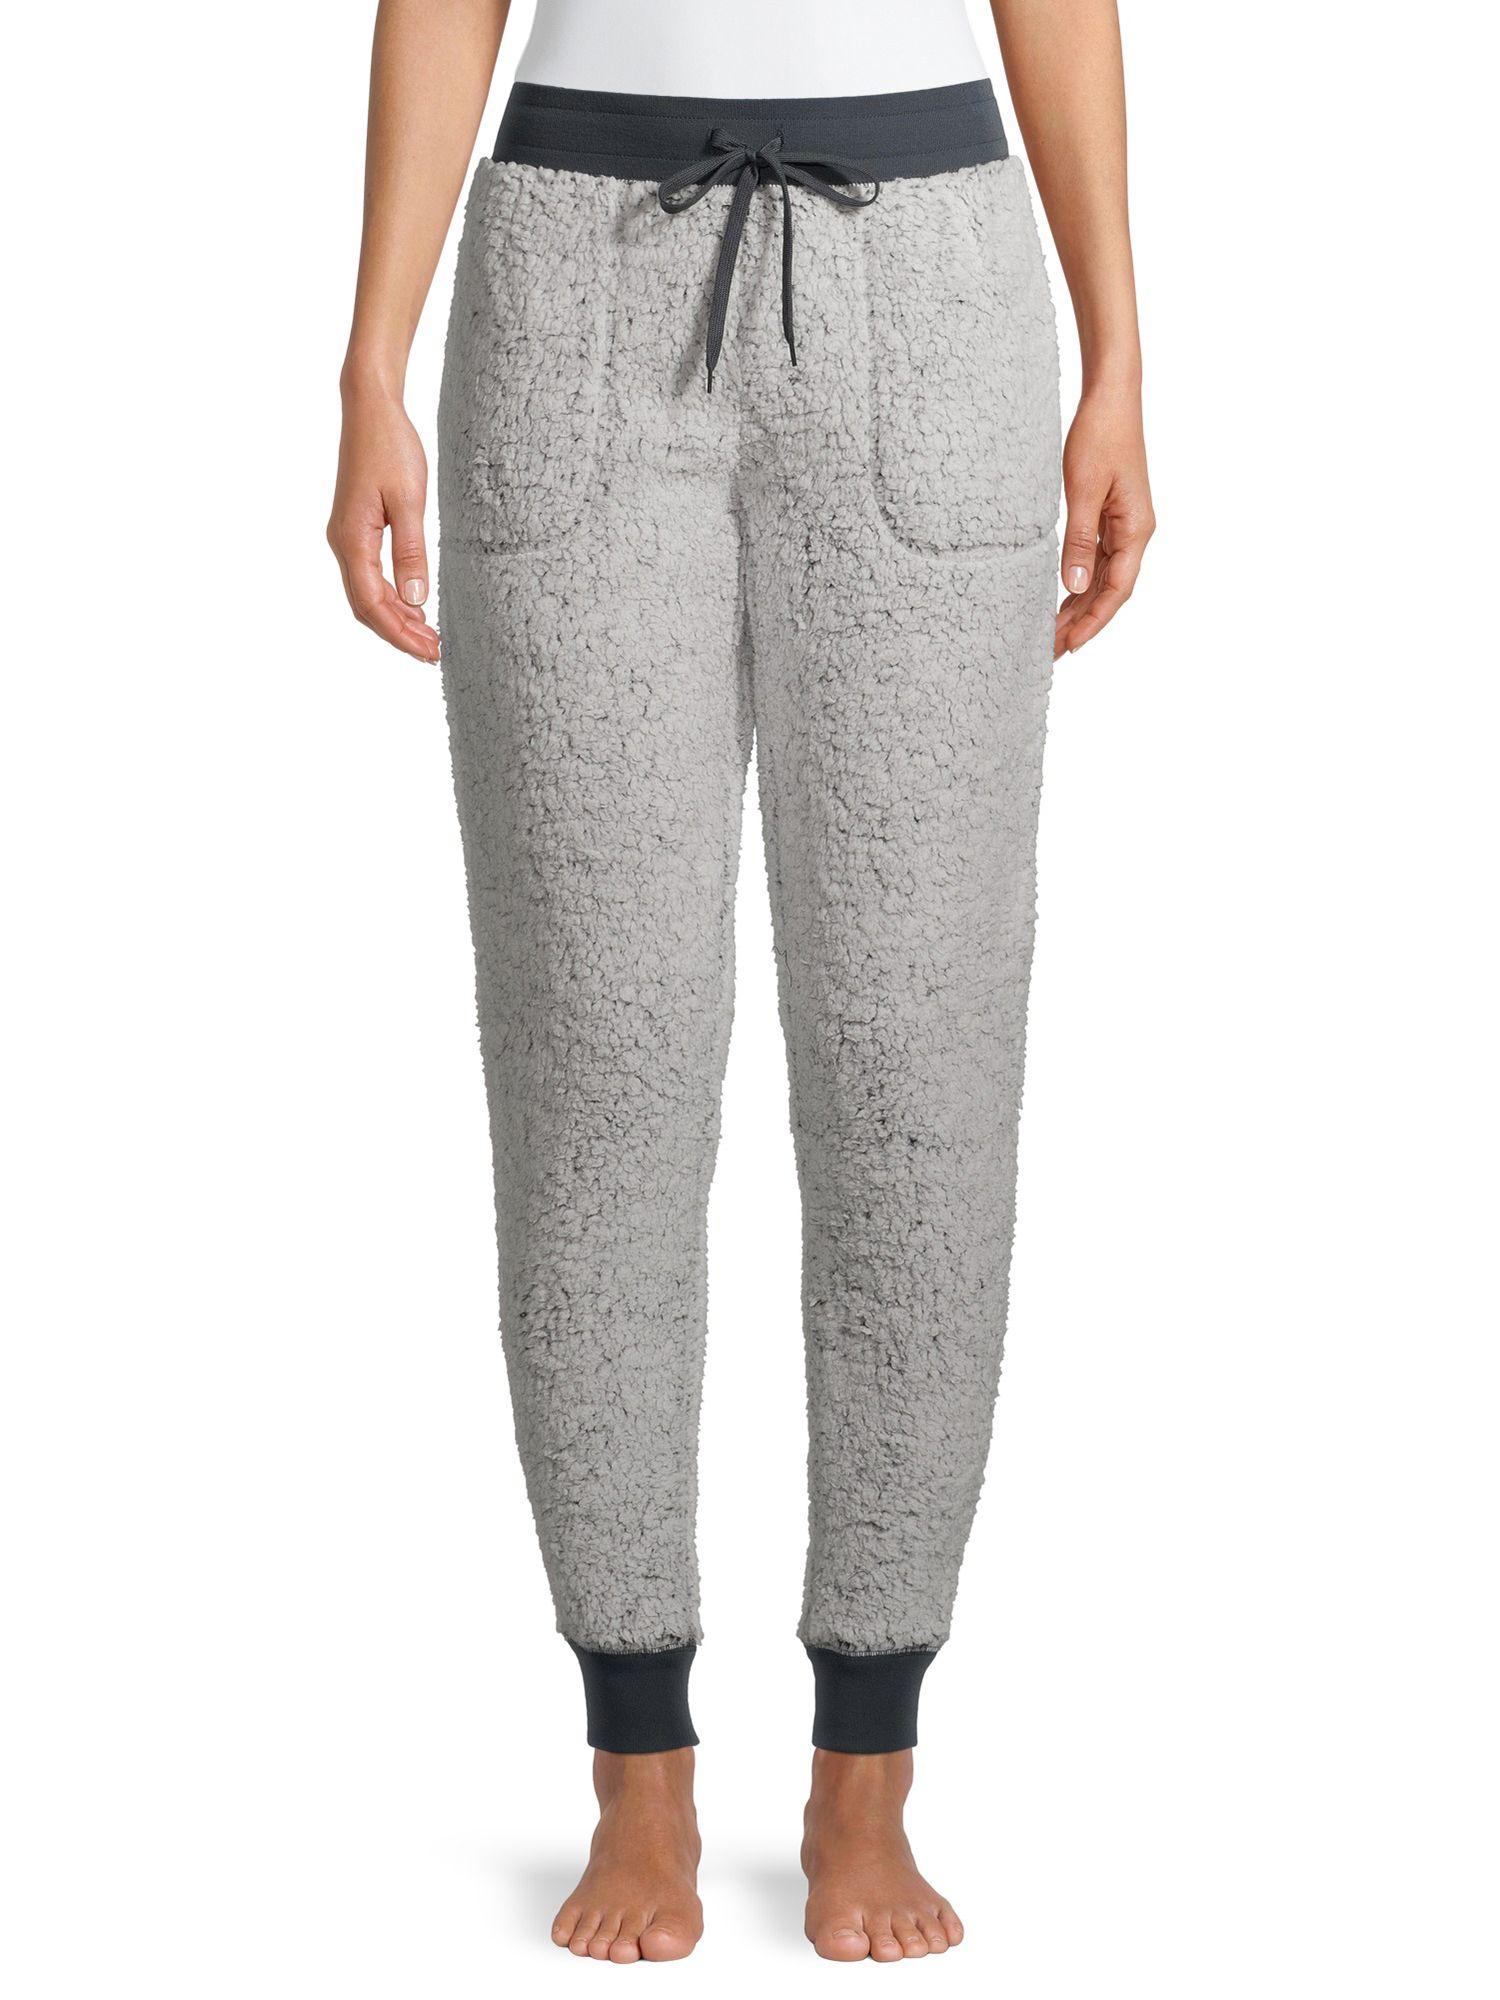 Secret Treasures Secret Treasures Women S And Women S Plus Sherpa Ankle Pants Walmart Com In 2021 Ankle Pants Pants For Women Soft Pajama Pants [ 2000 x 1500 Pixel ]